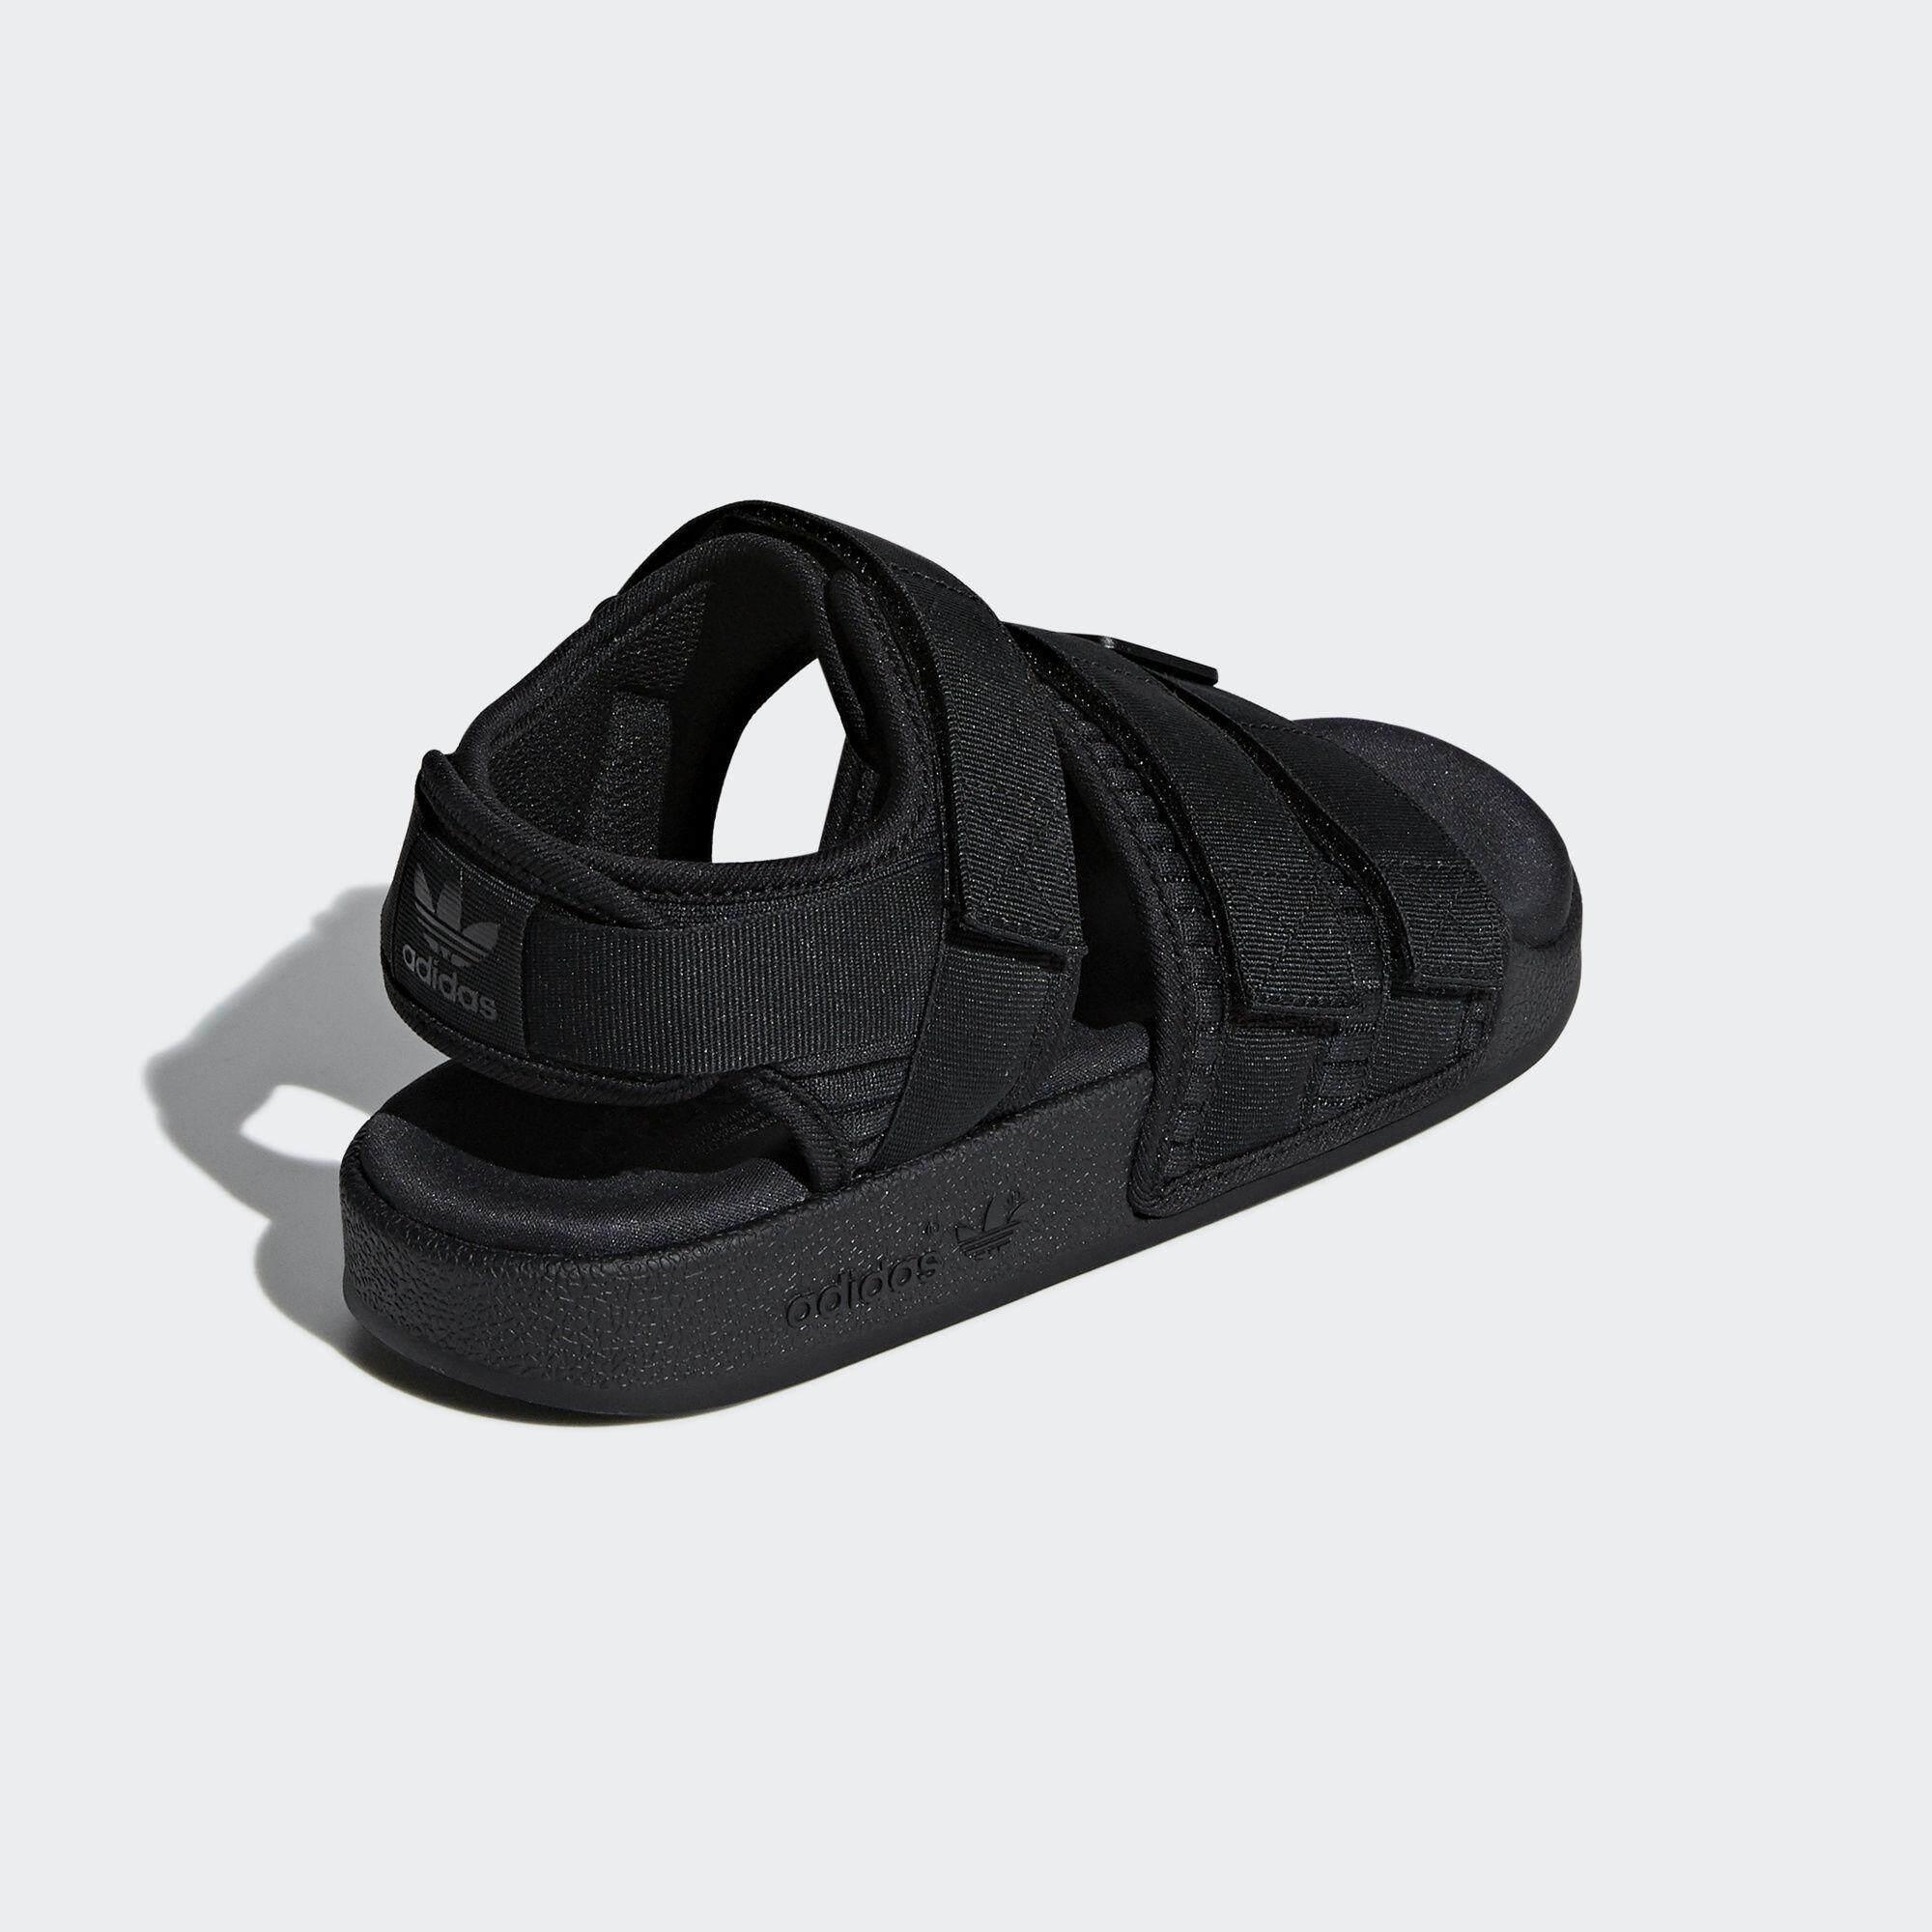 sandals adidas 2019